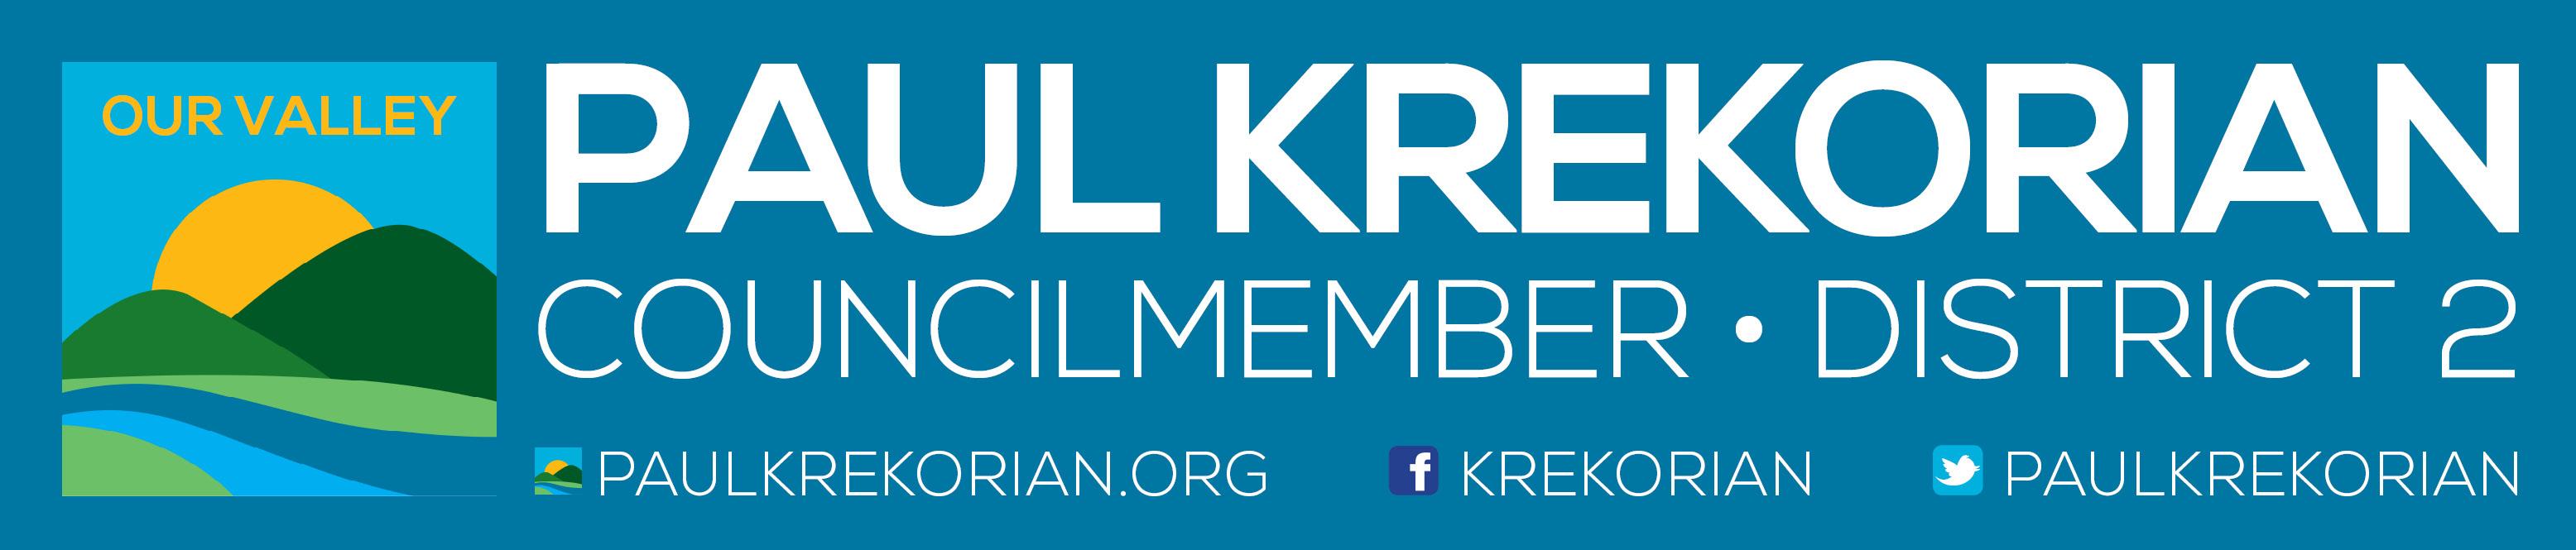 PK Press Release Header_Blue